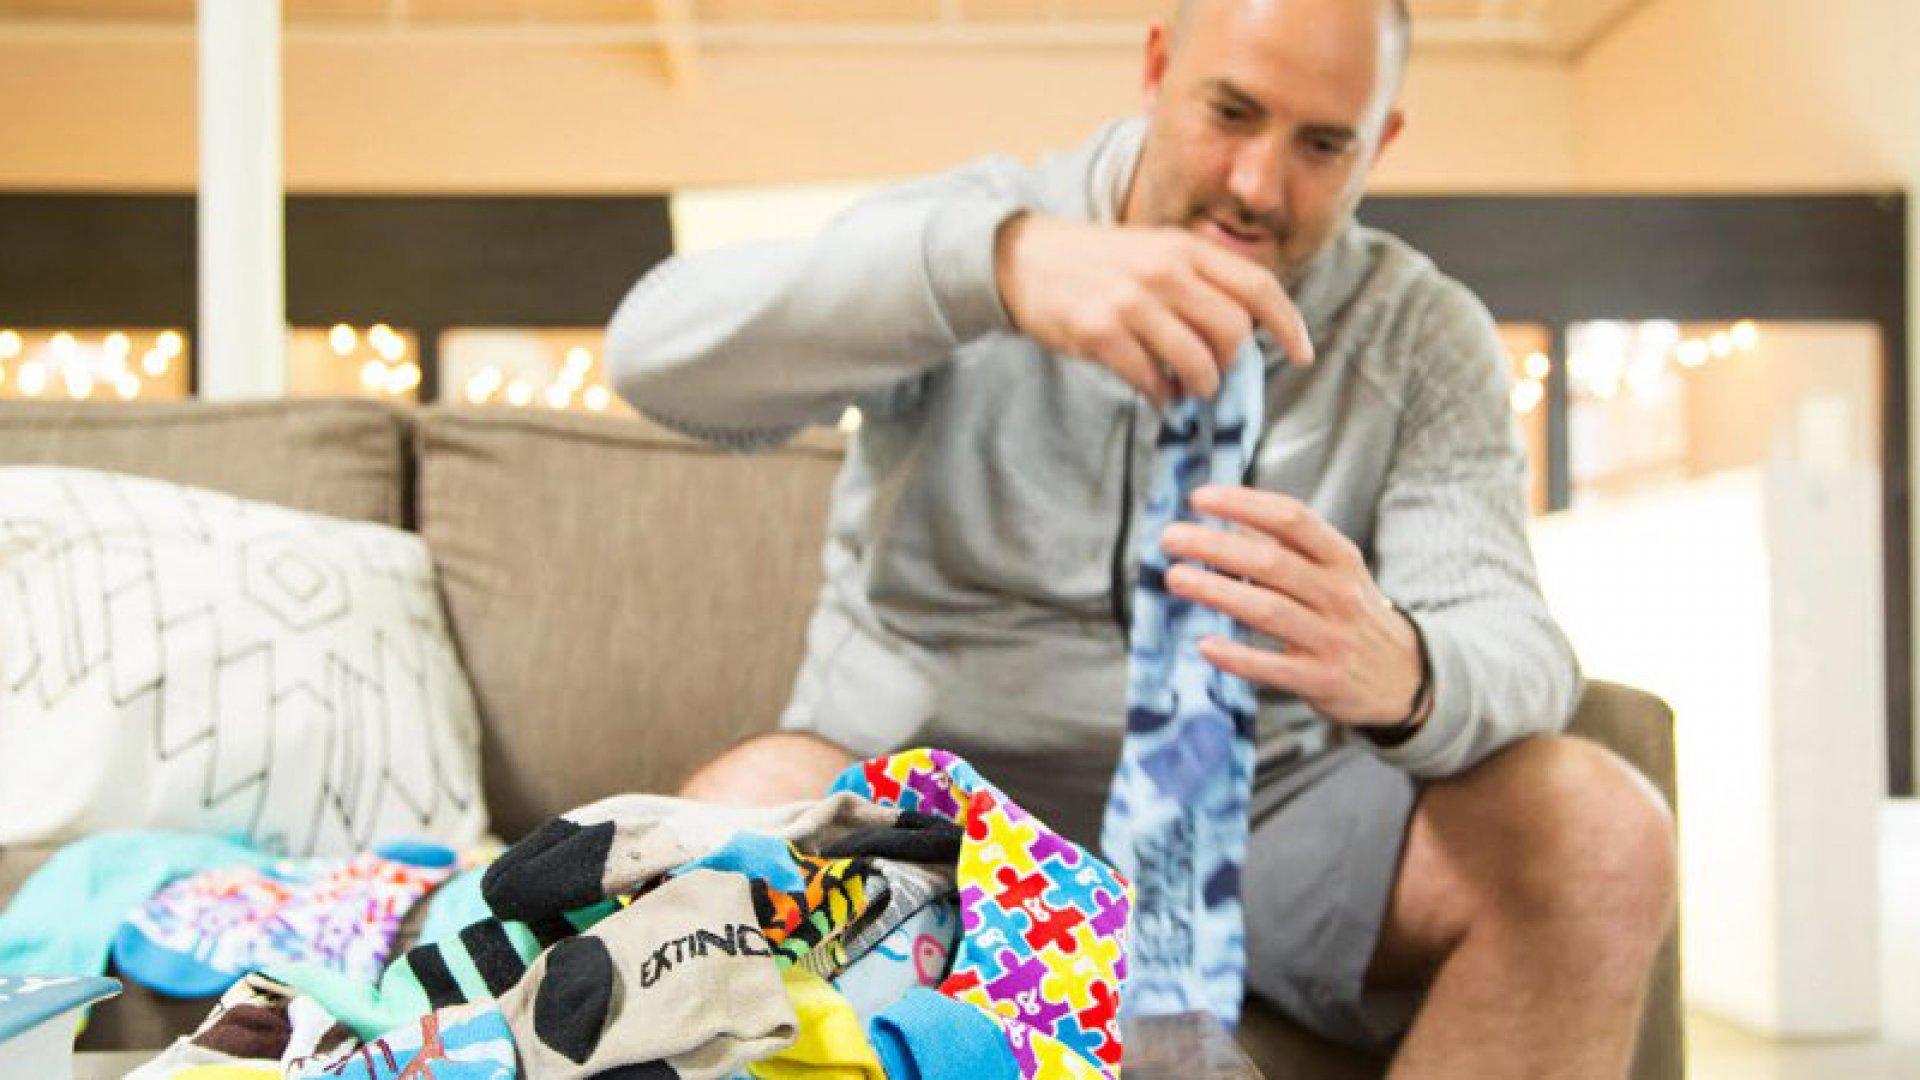 Ryan Berman, Founder of Sock Problems.